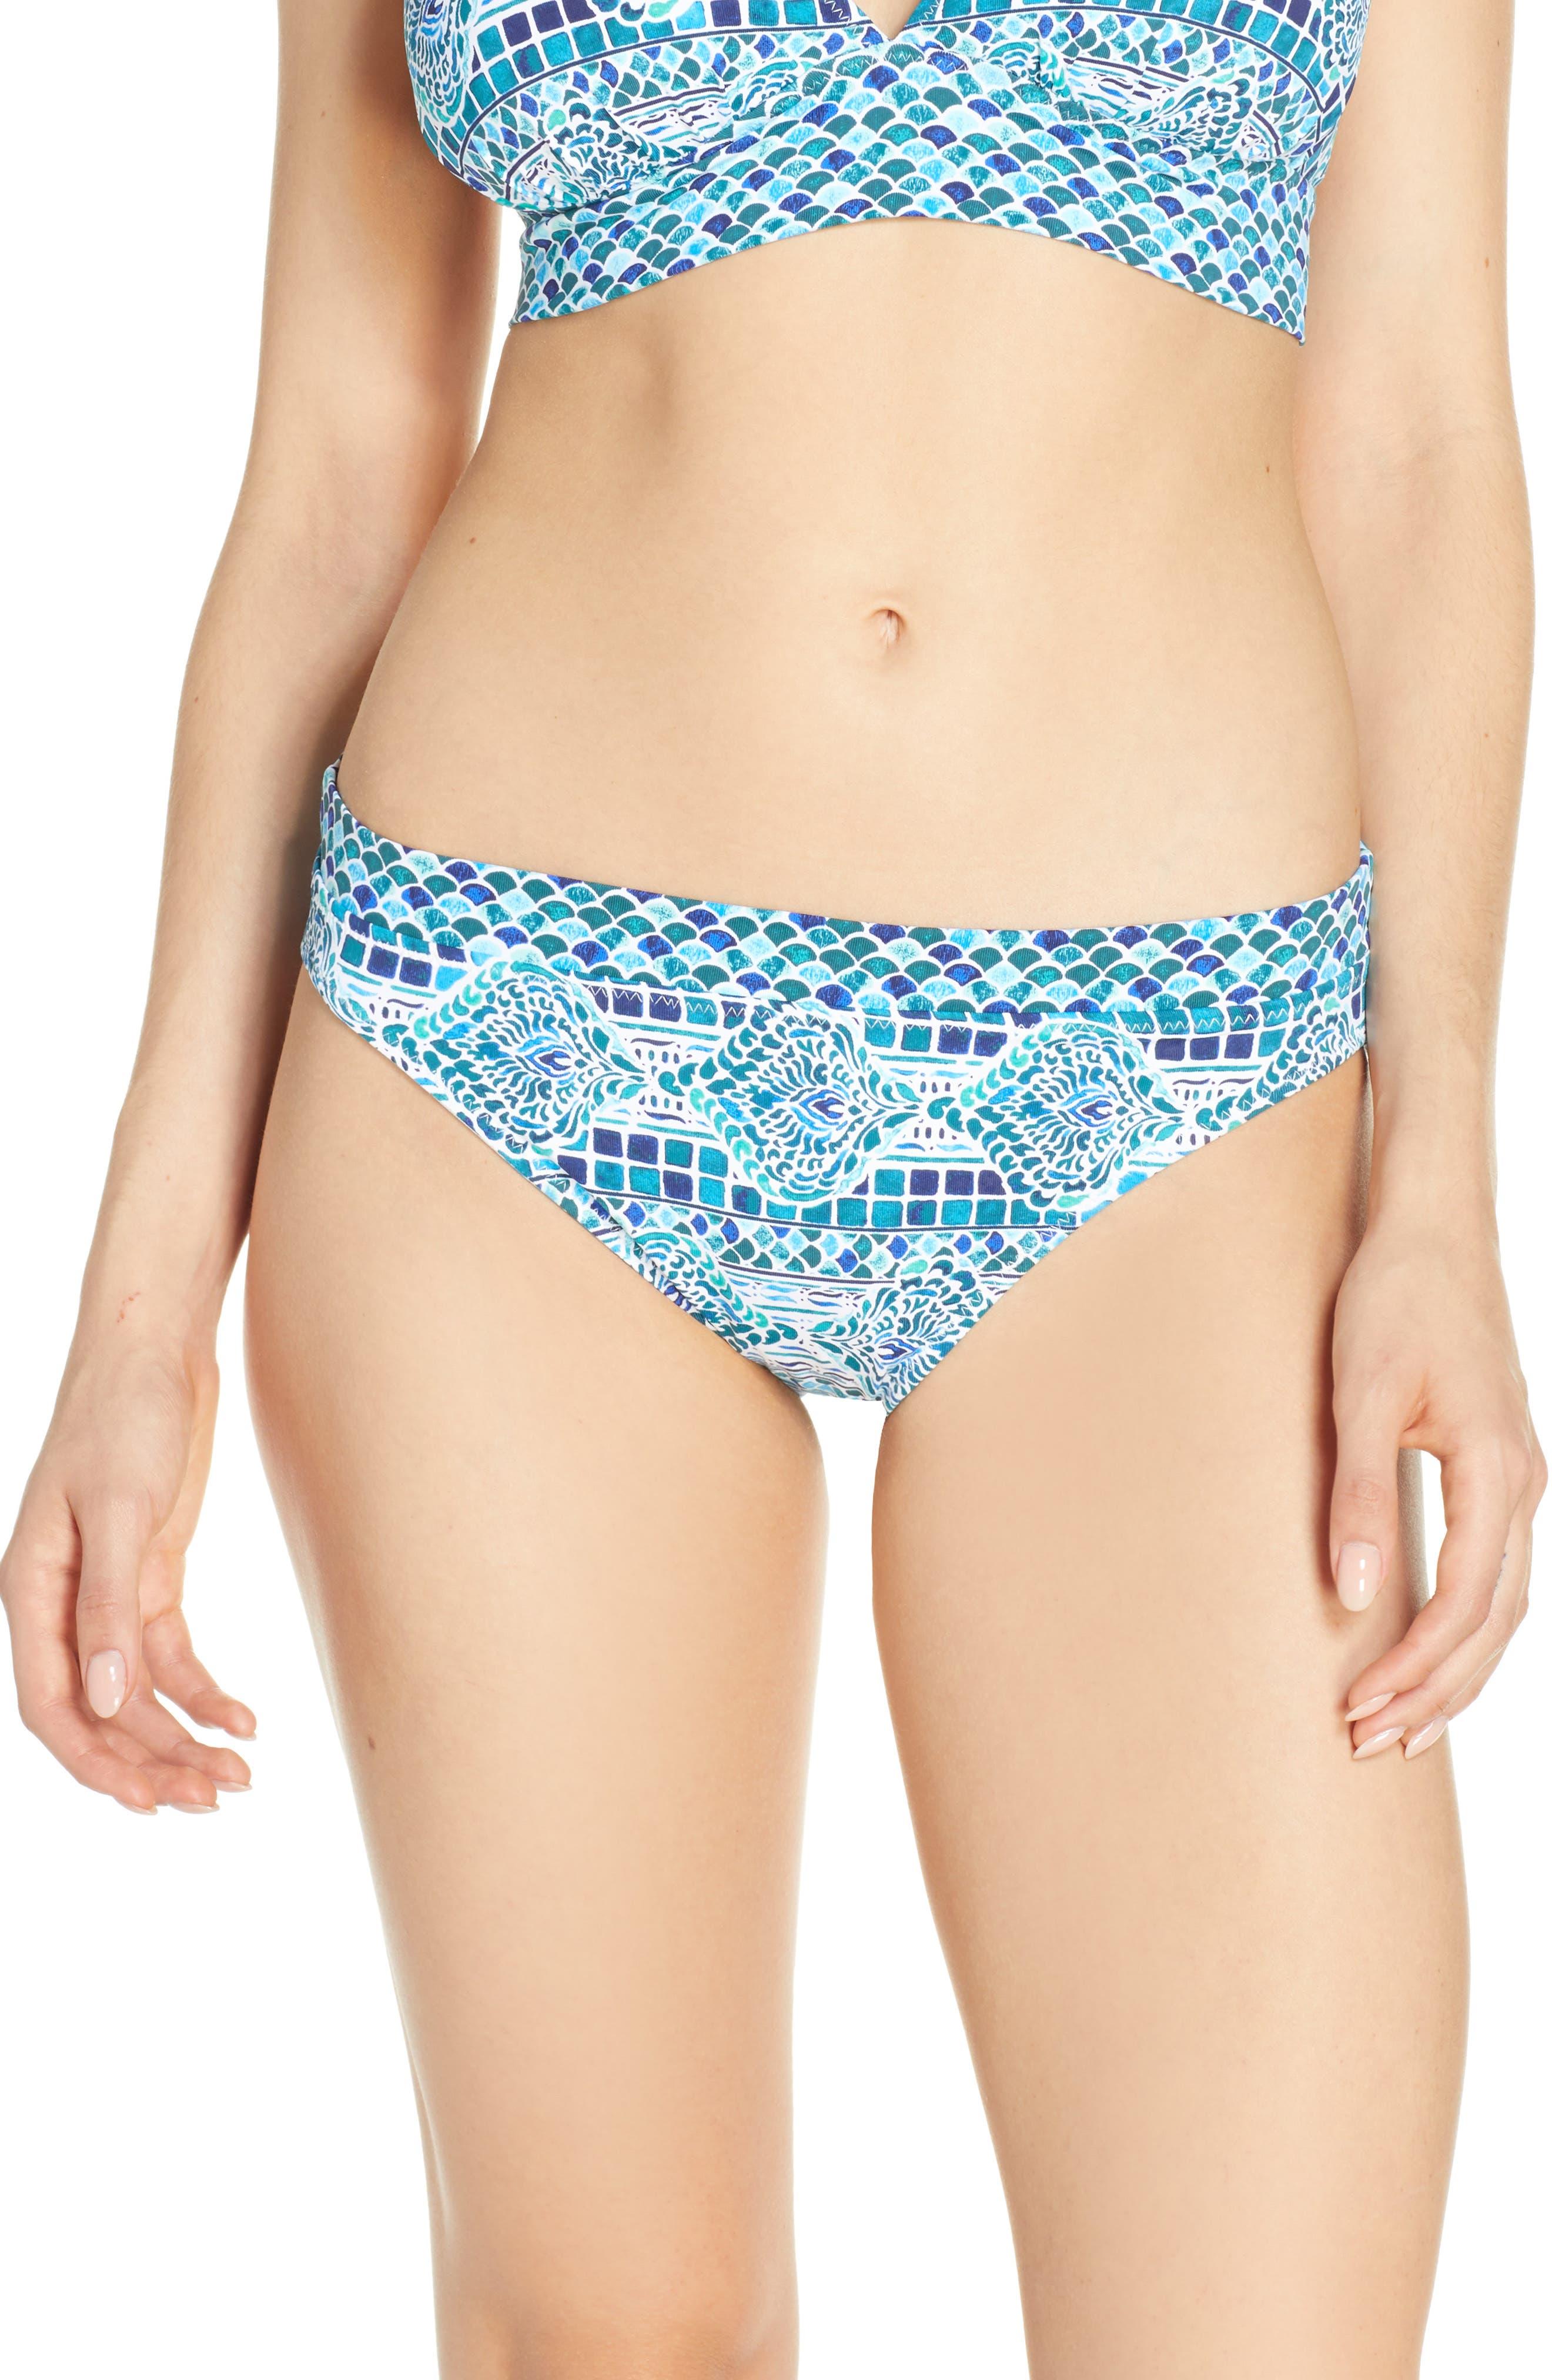 Tommy Bahama Floral Isles Reversible Bikini Bottoms, Blue/green